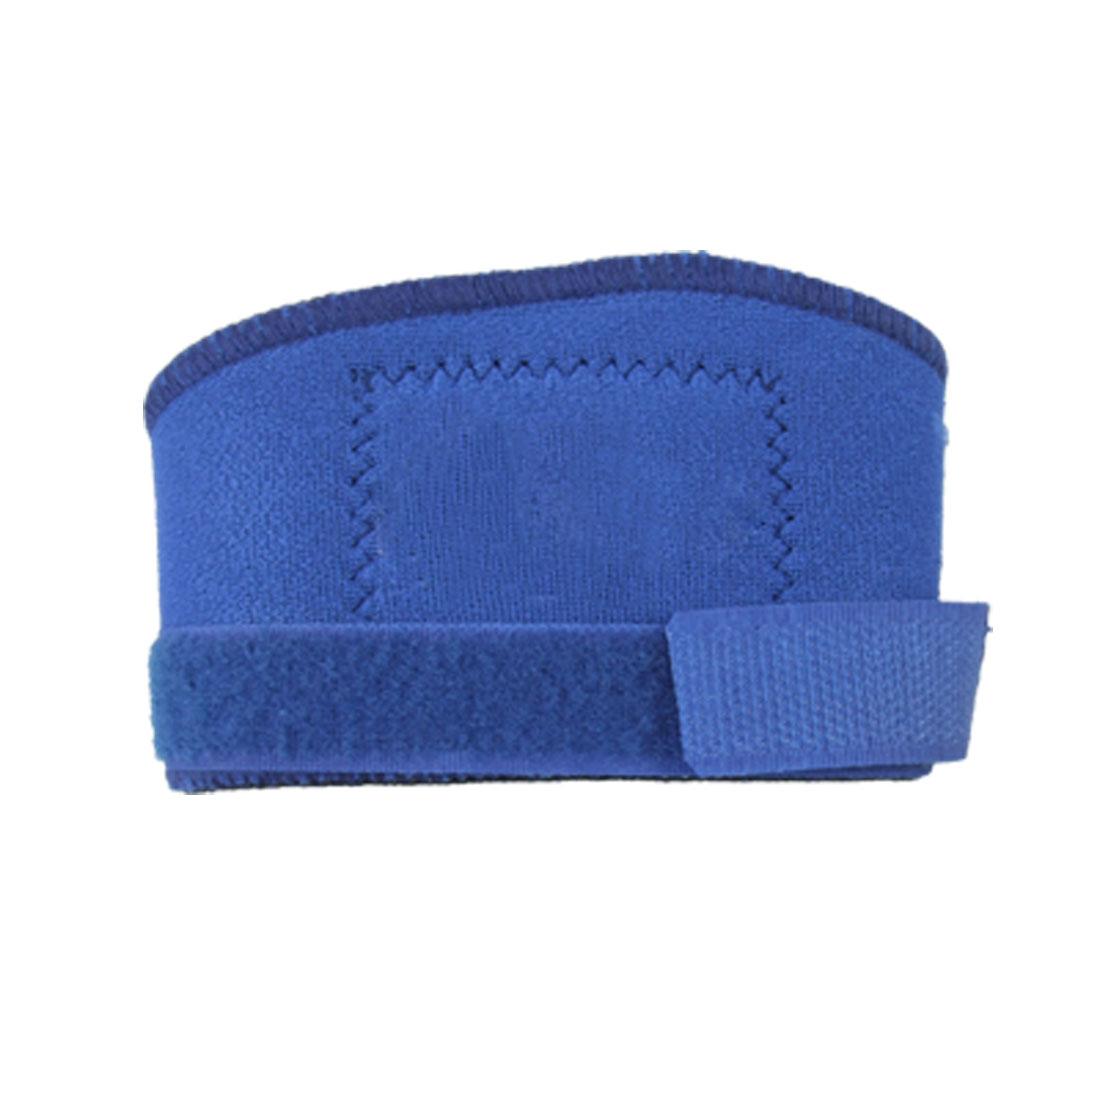 Neoprene Adjustable Sports Knee Support Protector Blue